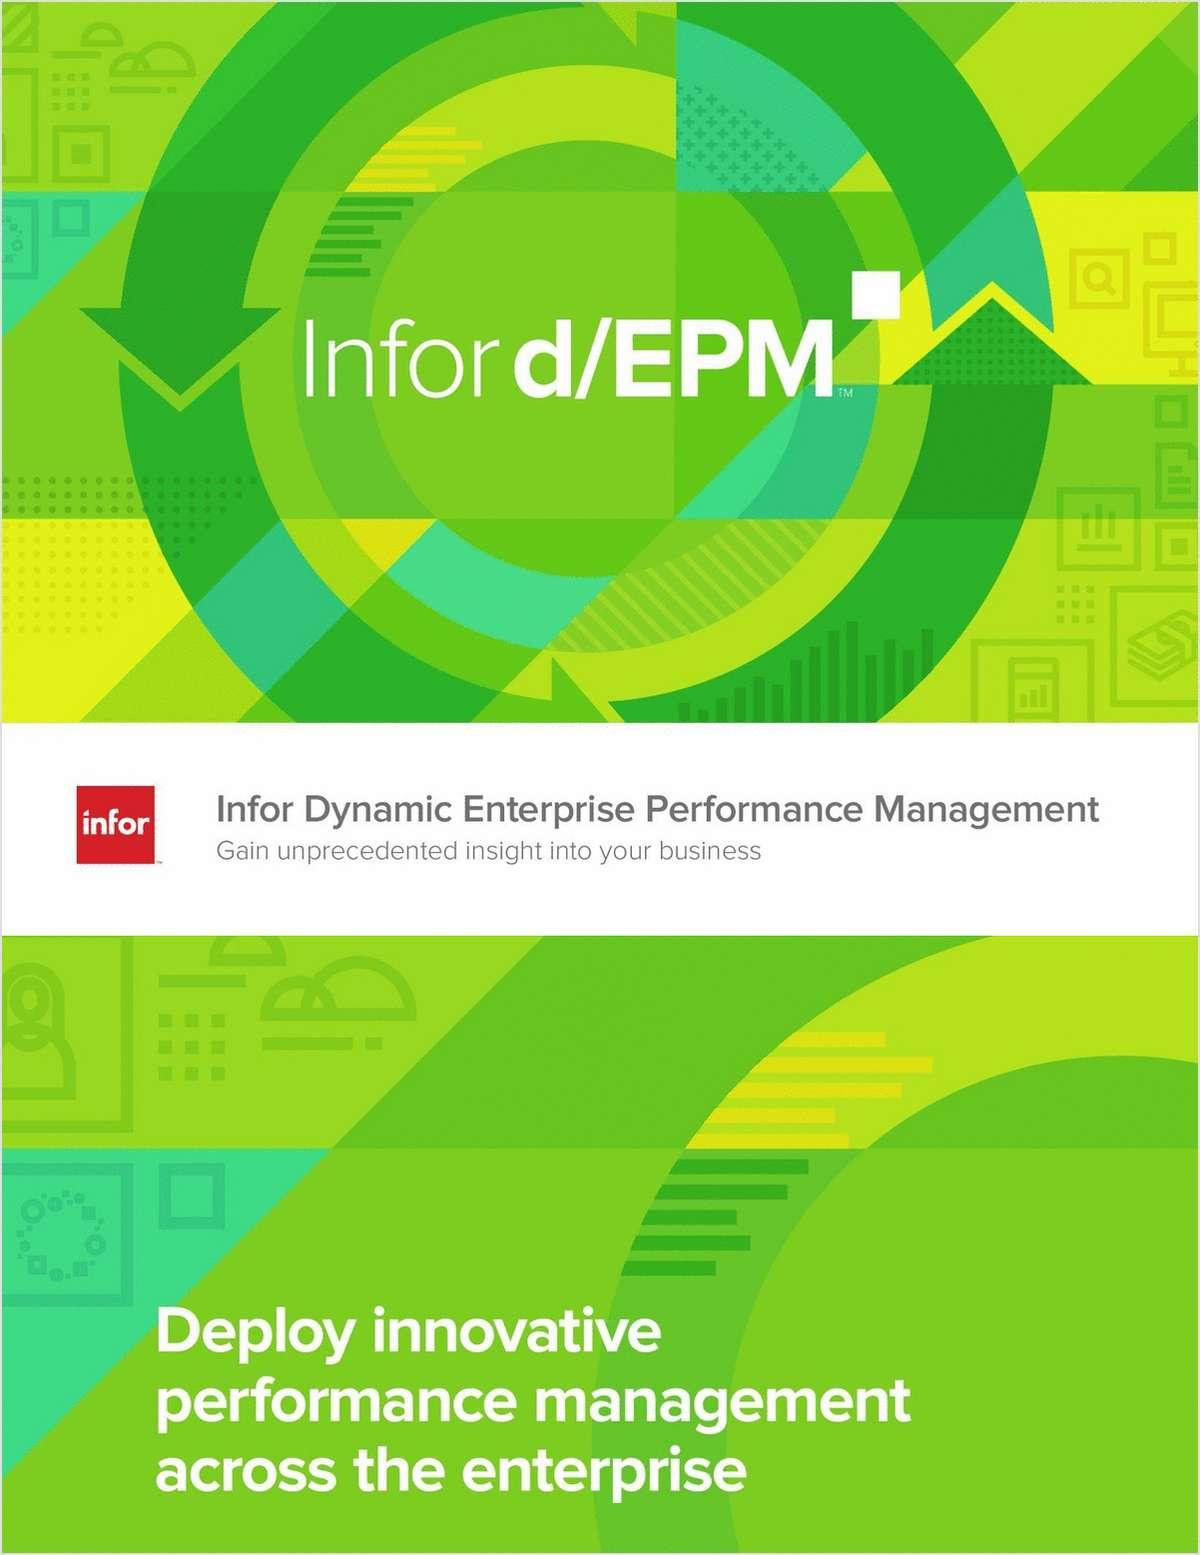 Infor Dynamic Enterprise Performance Management